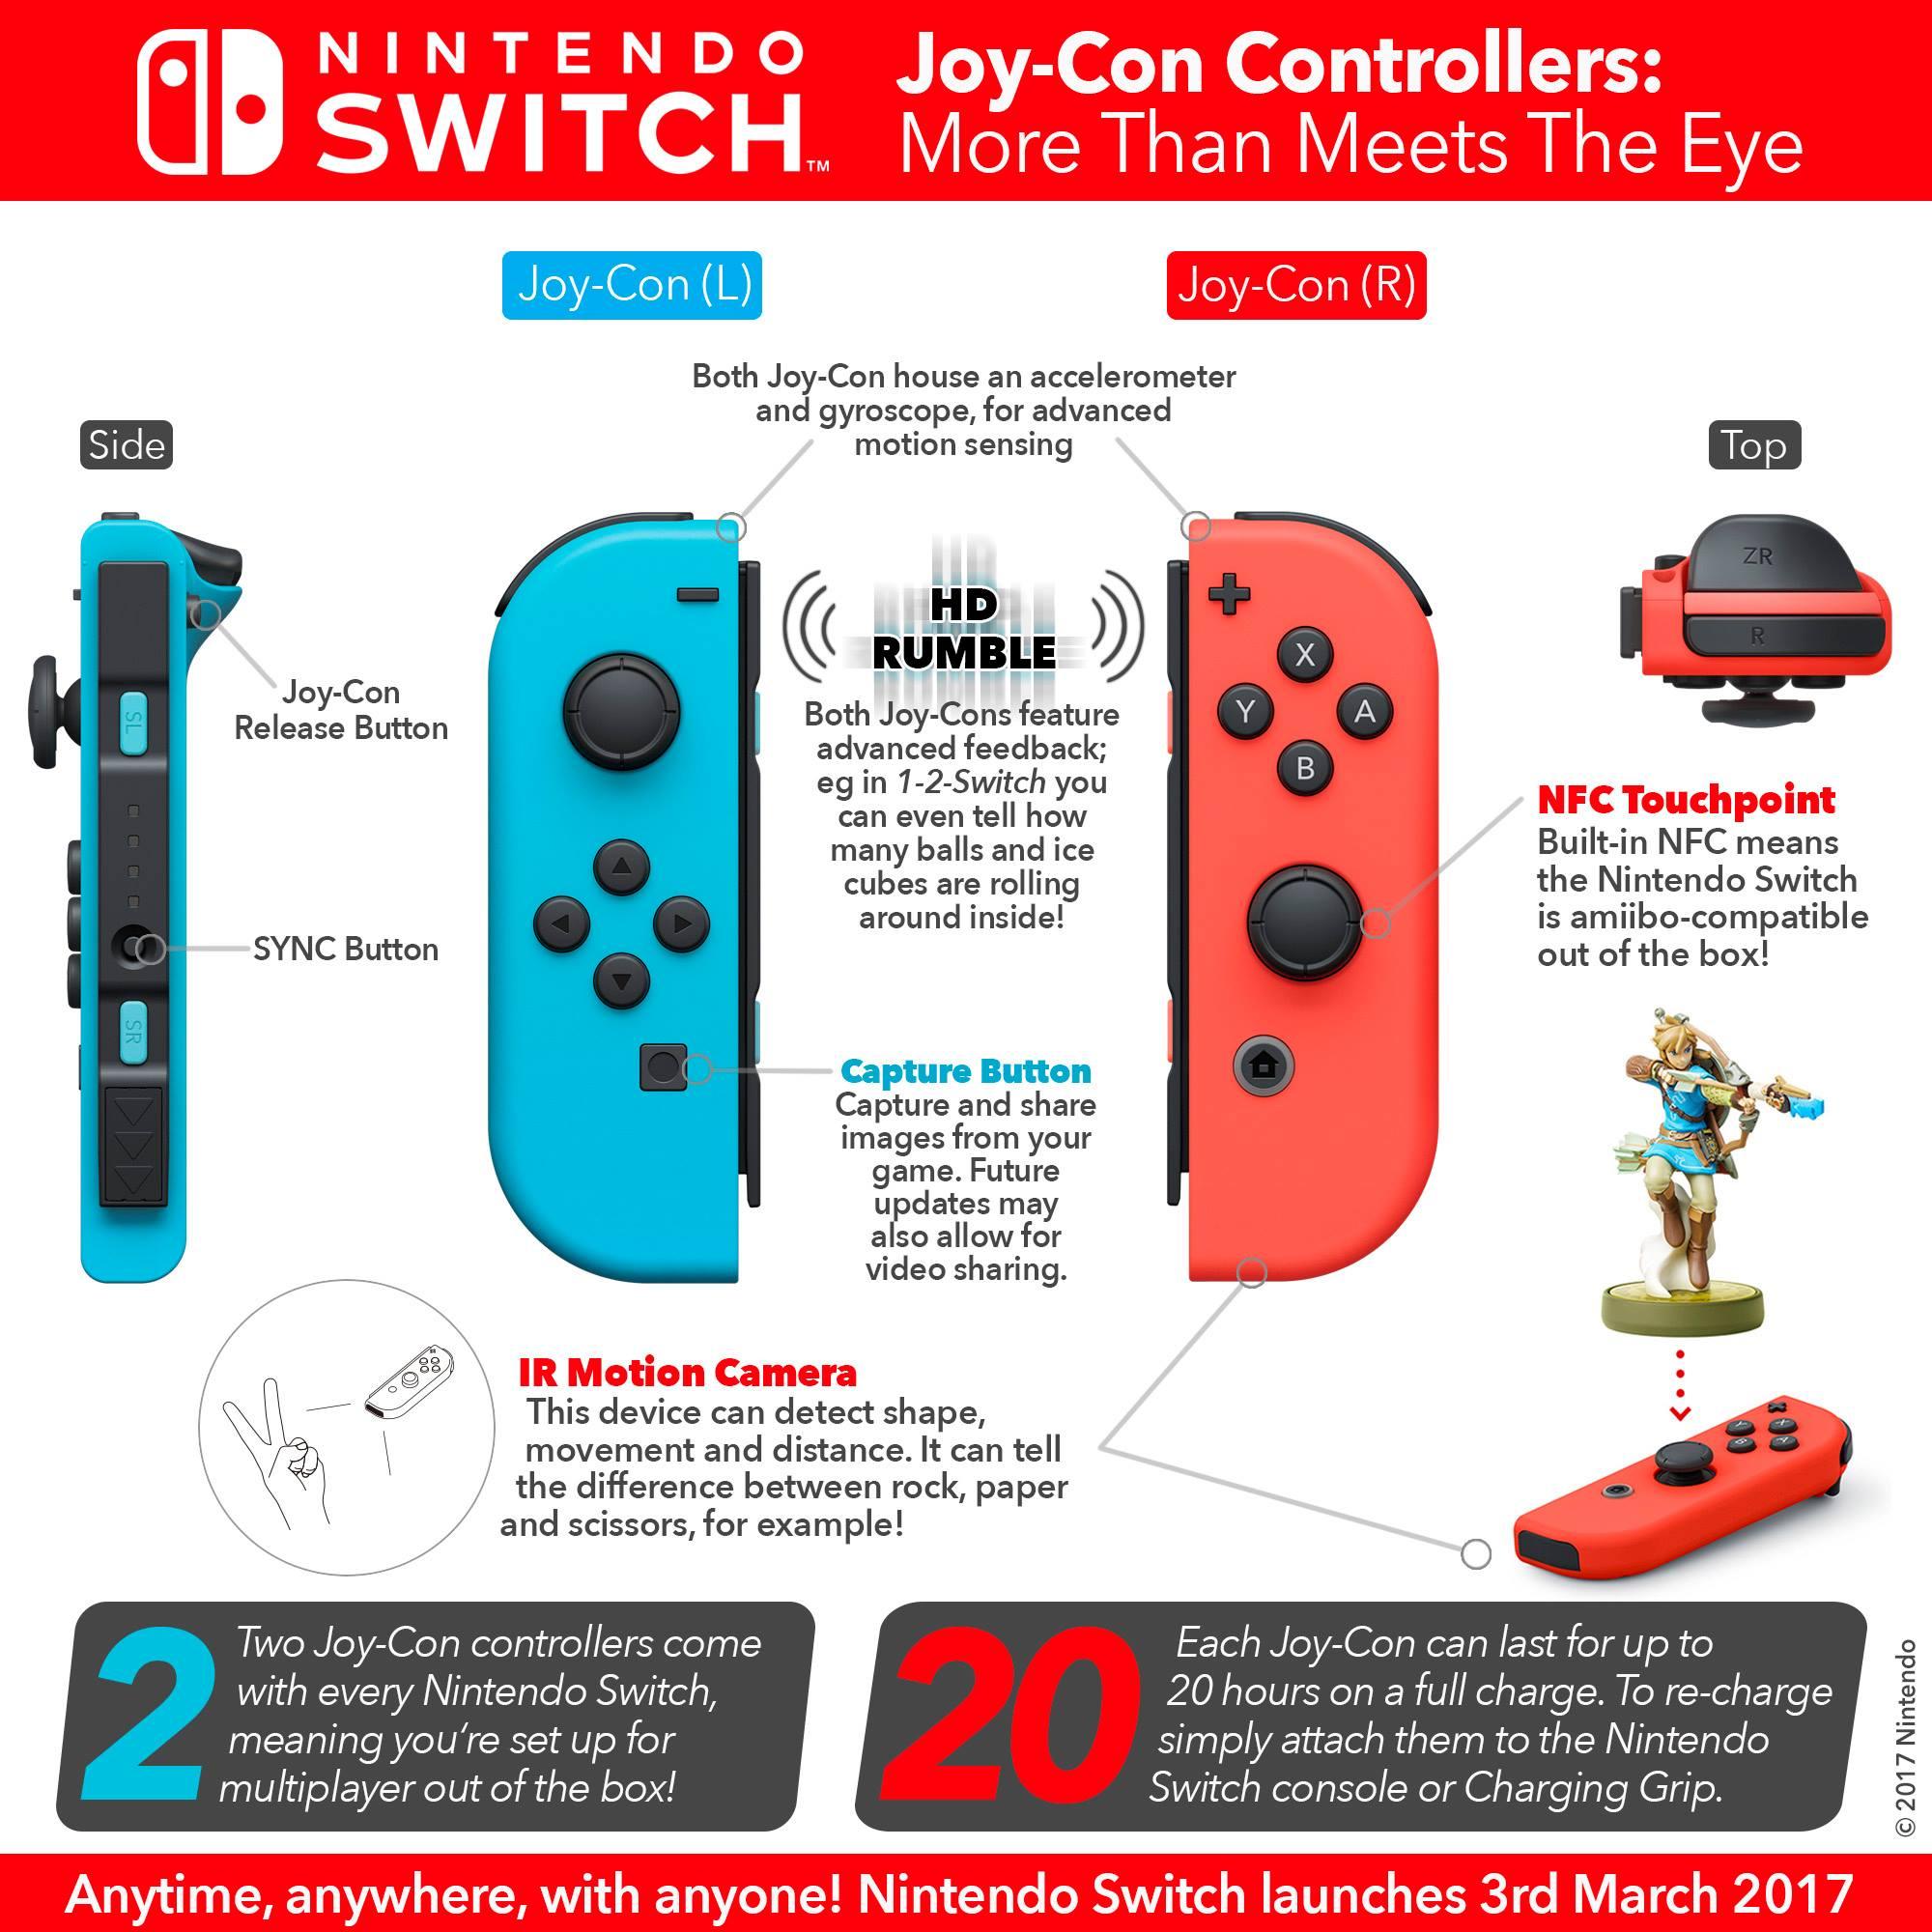 Official Nintendo Switch Joy-Con Infographic - Nintendo Times